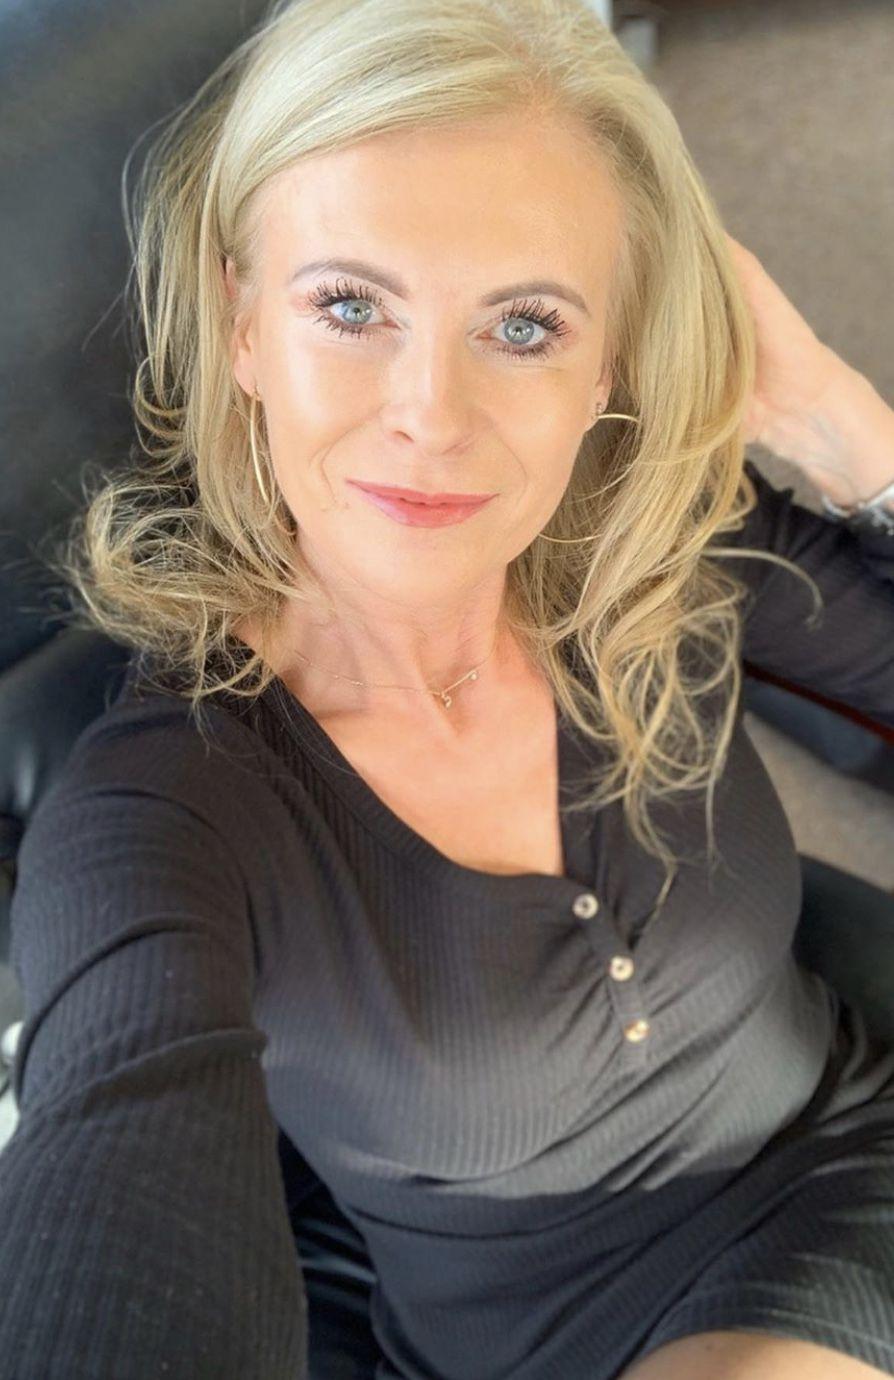 Pin van Carine Diana Iglesias 🌸💞 op Hotdog | Vrouw